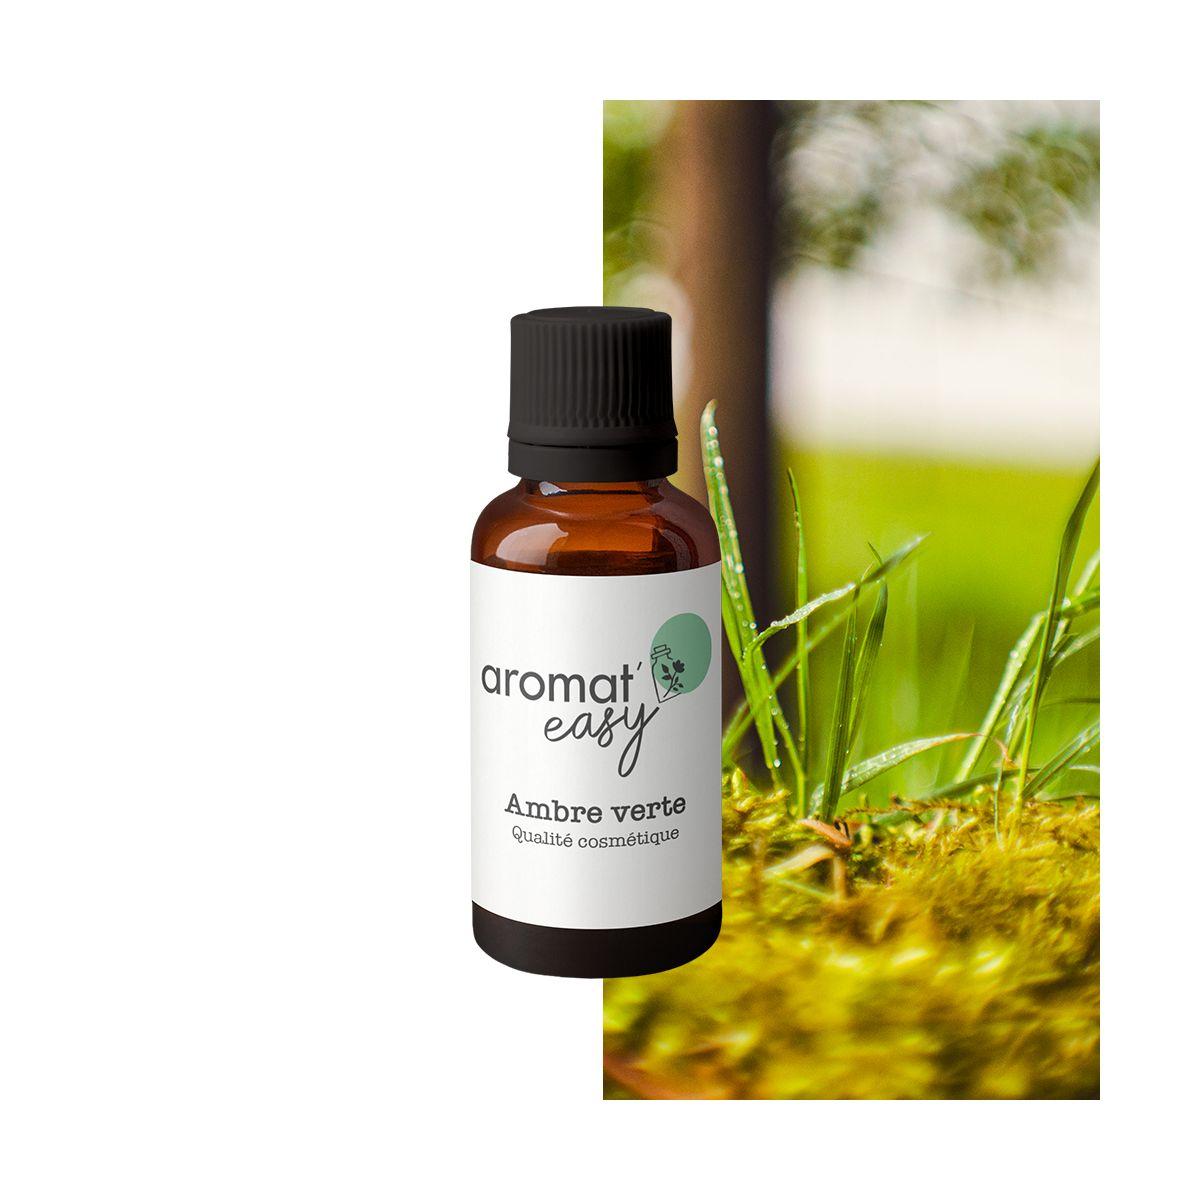 Fragrance Ambre verte